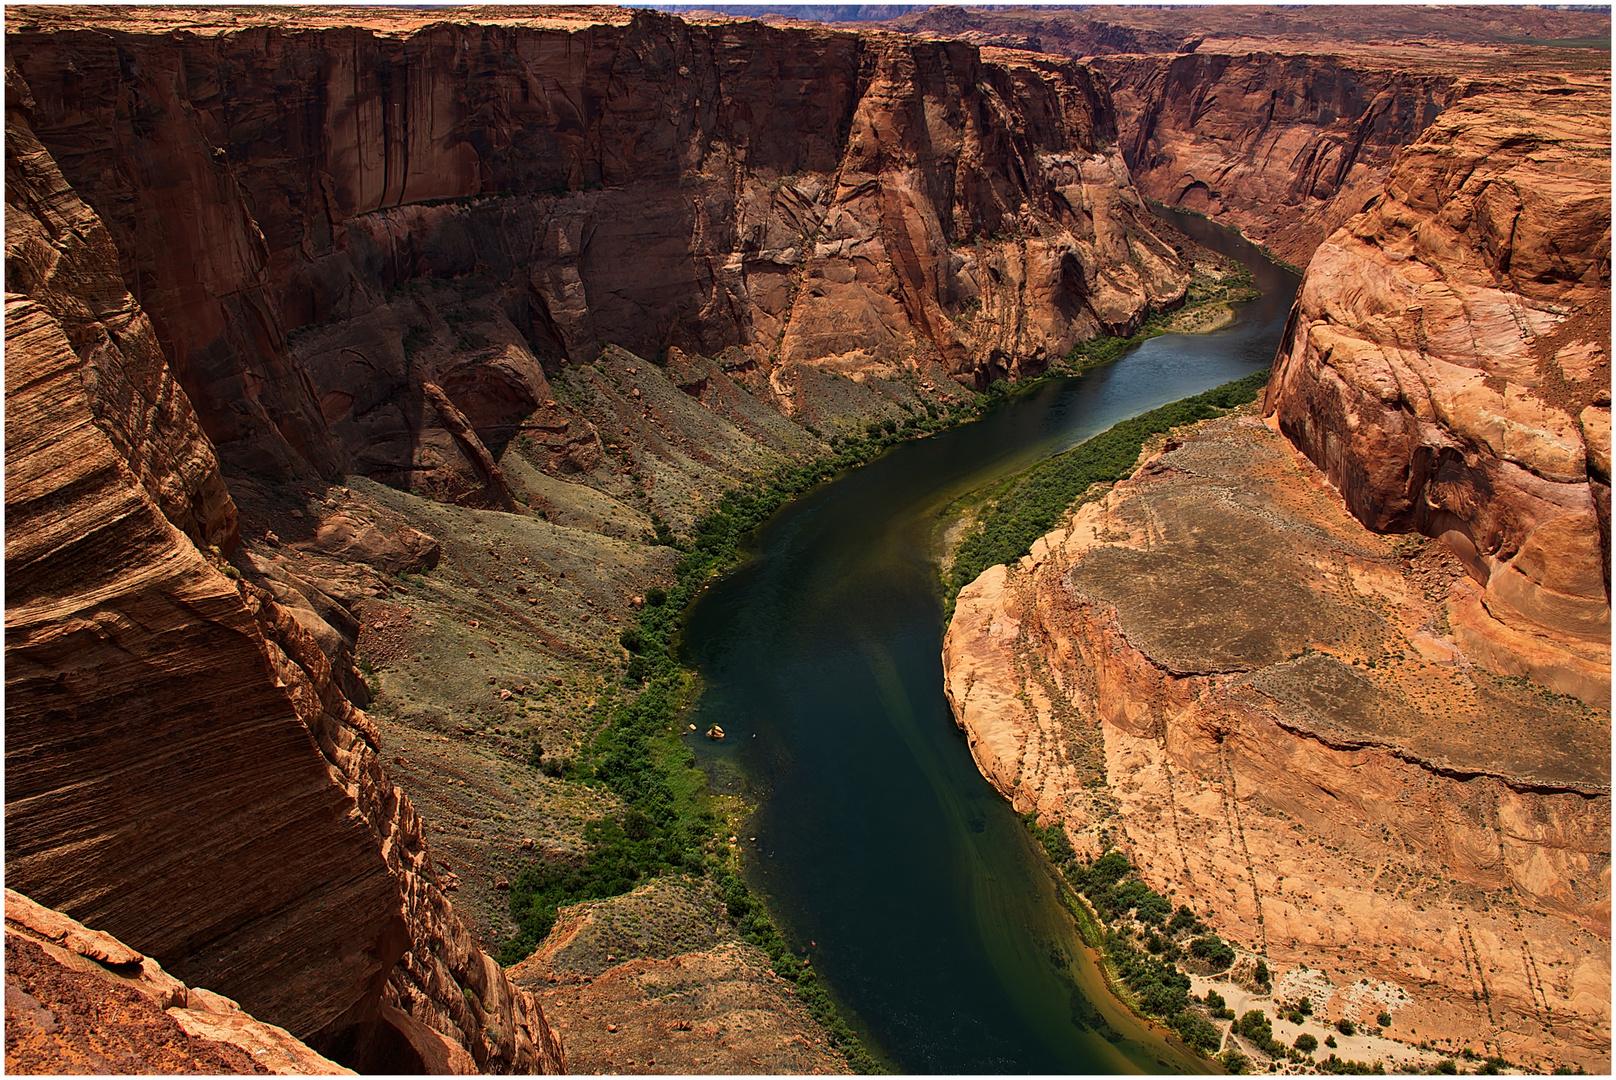 green river ;-)